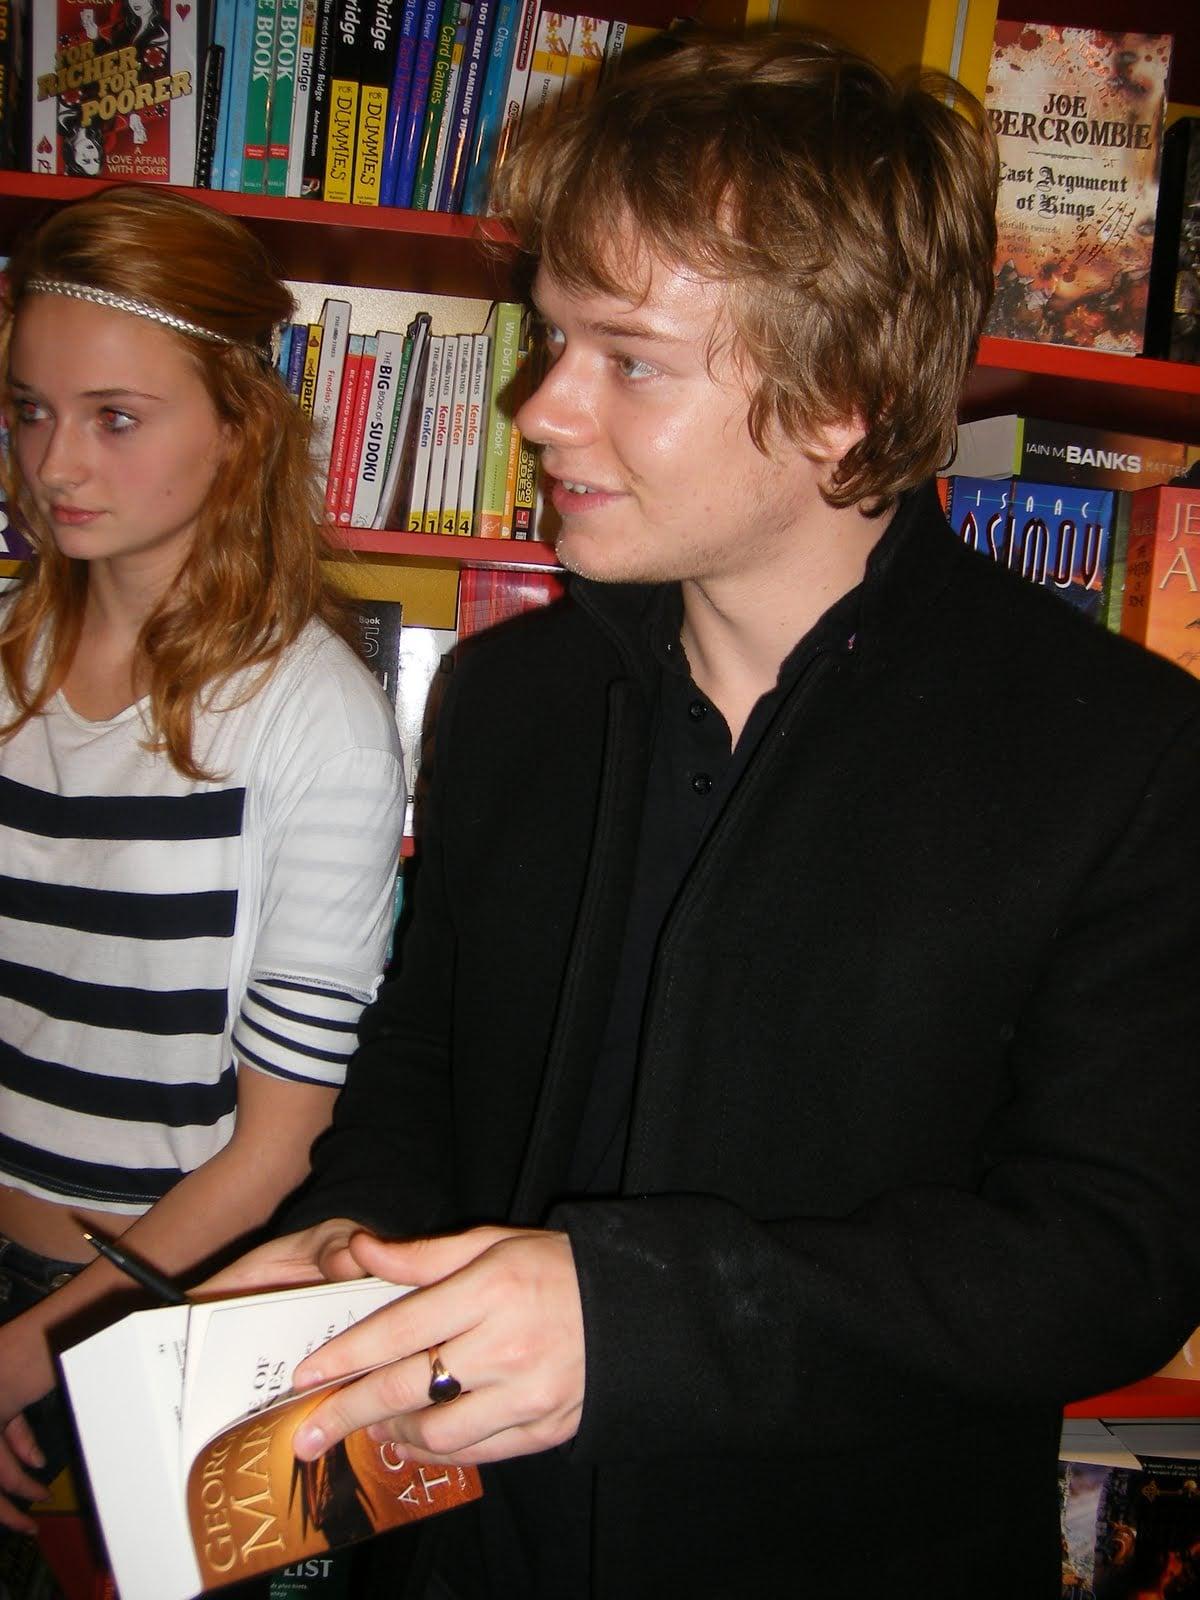 Sophie Turner (Sansa Stark) and Alfie Allen (Theon Greyjoy) — I cannot. Source: Blogspot user thewertzone